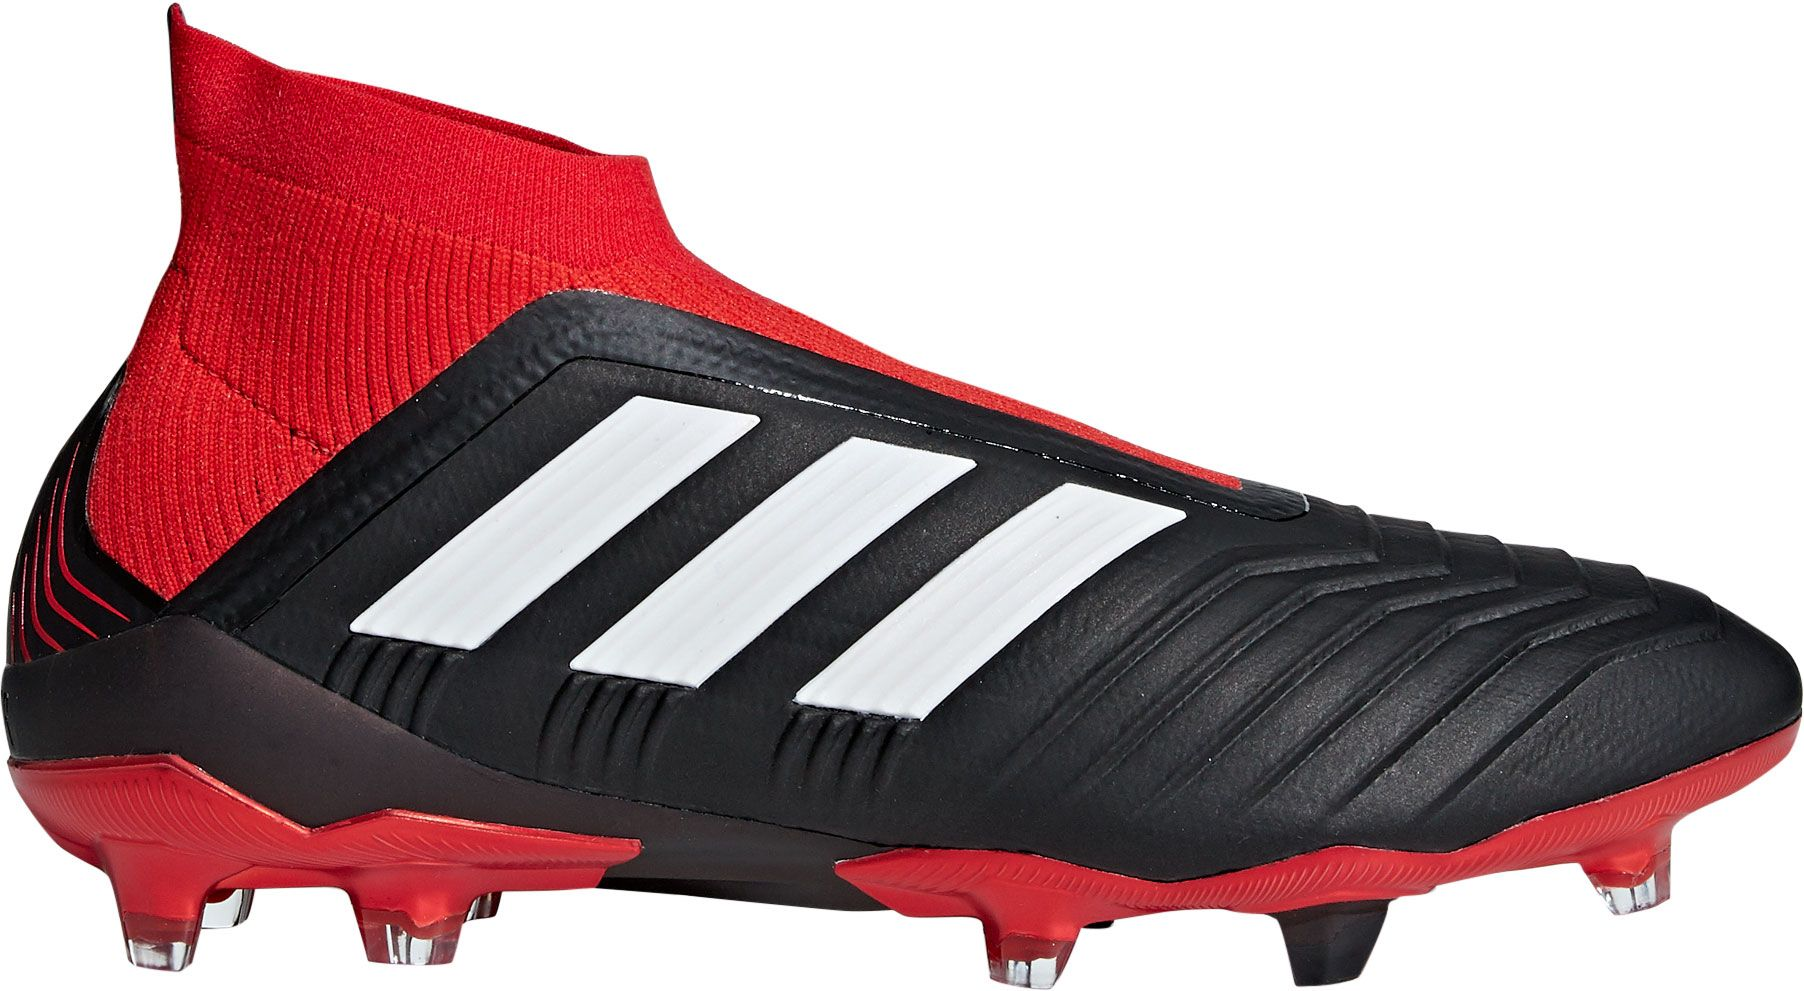 adidas Men's Predator 18+ FG Soccer Cleats, Size: 13.0, Black